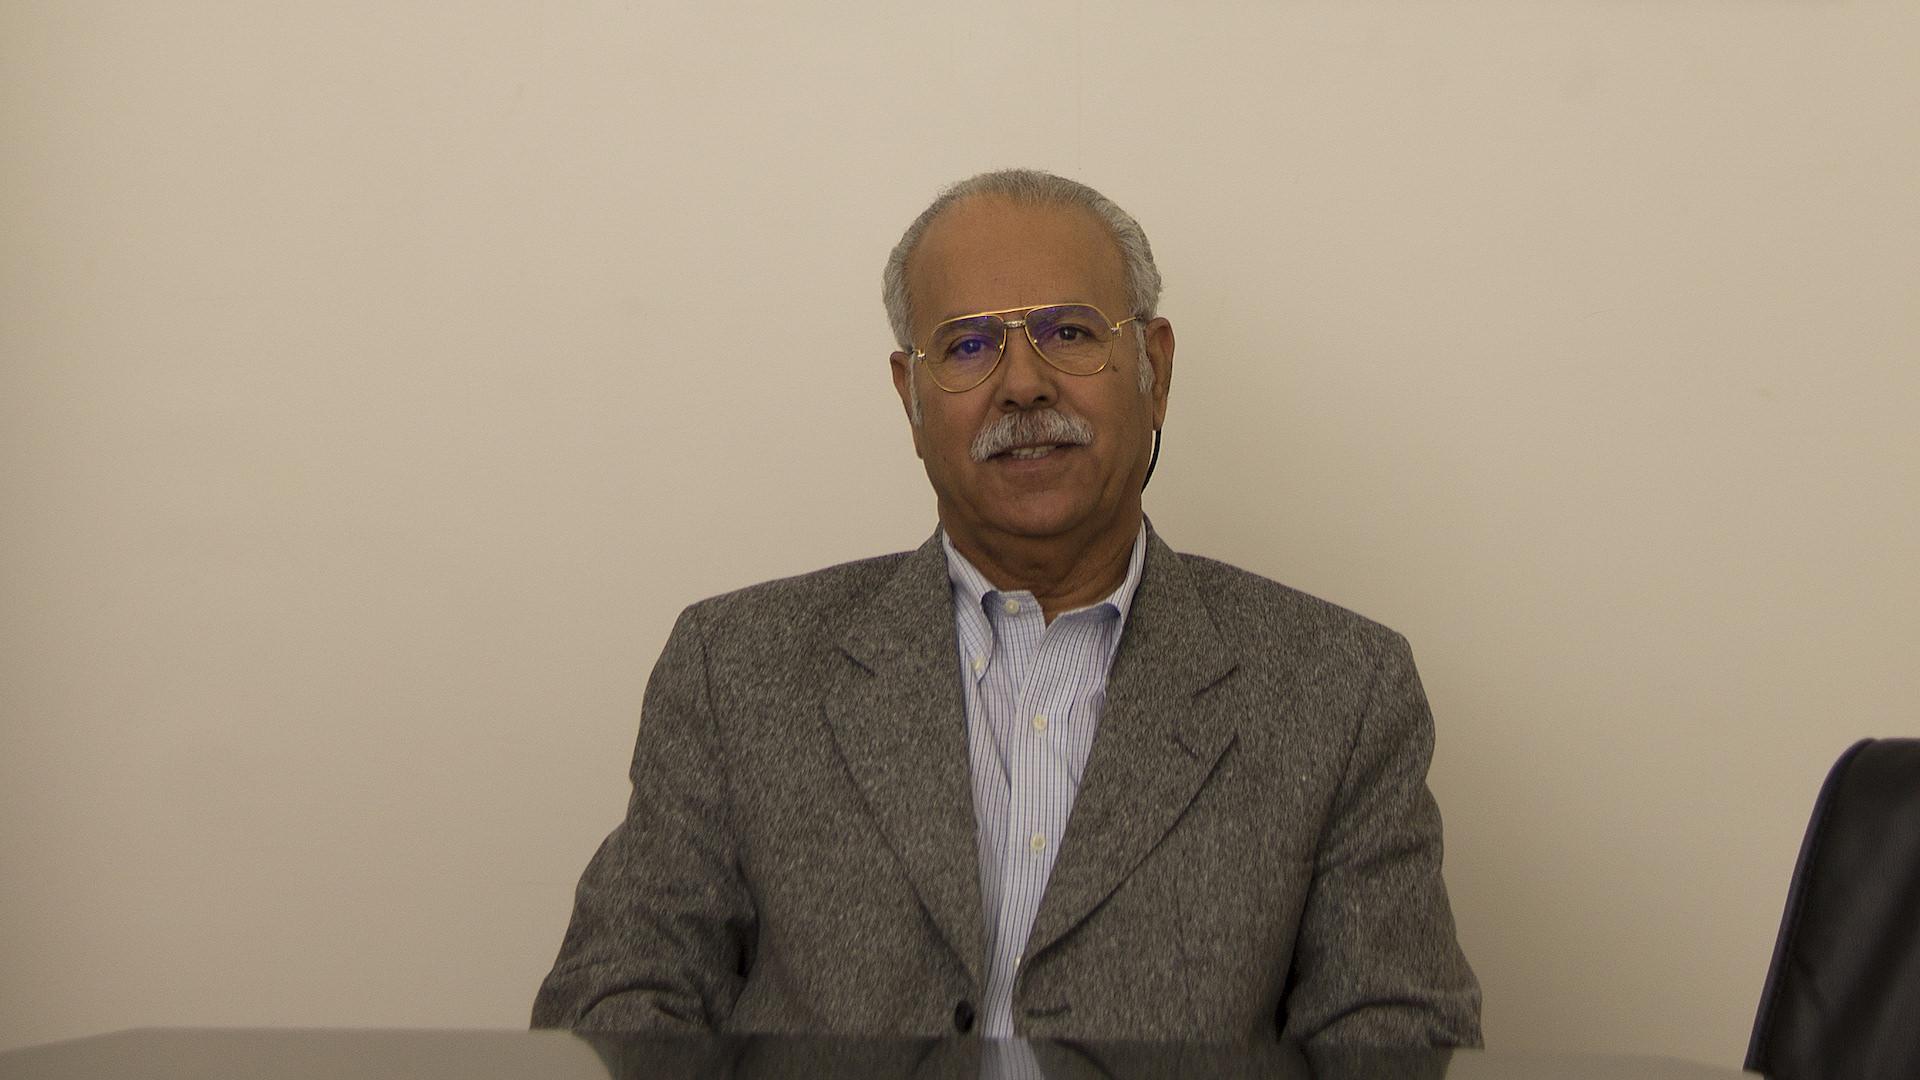 Dr. Hamad Bin Shams